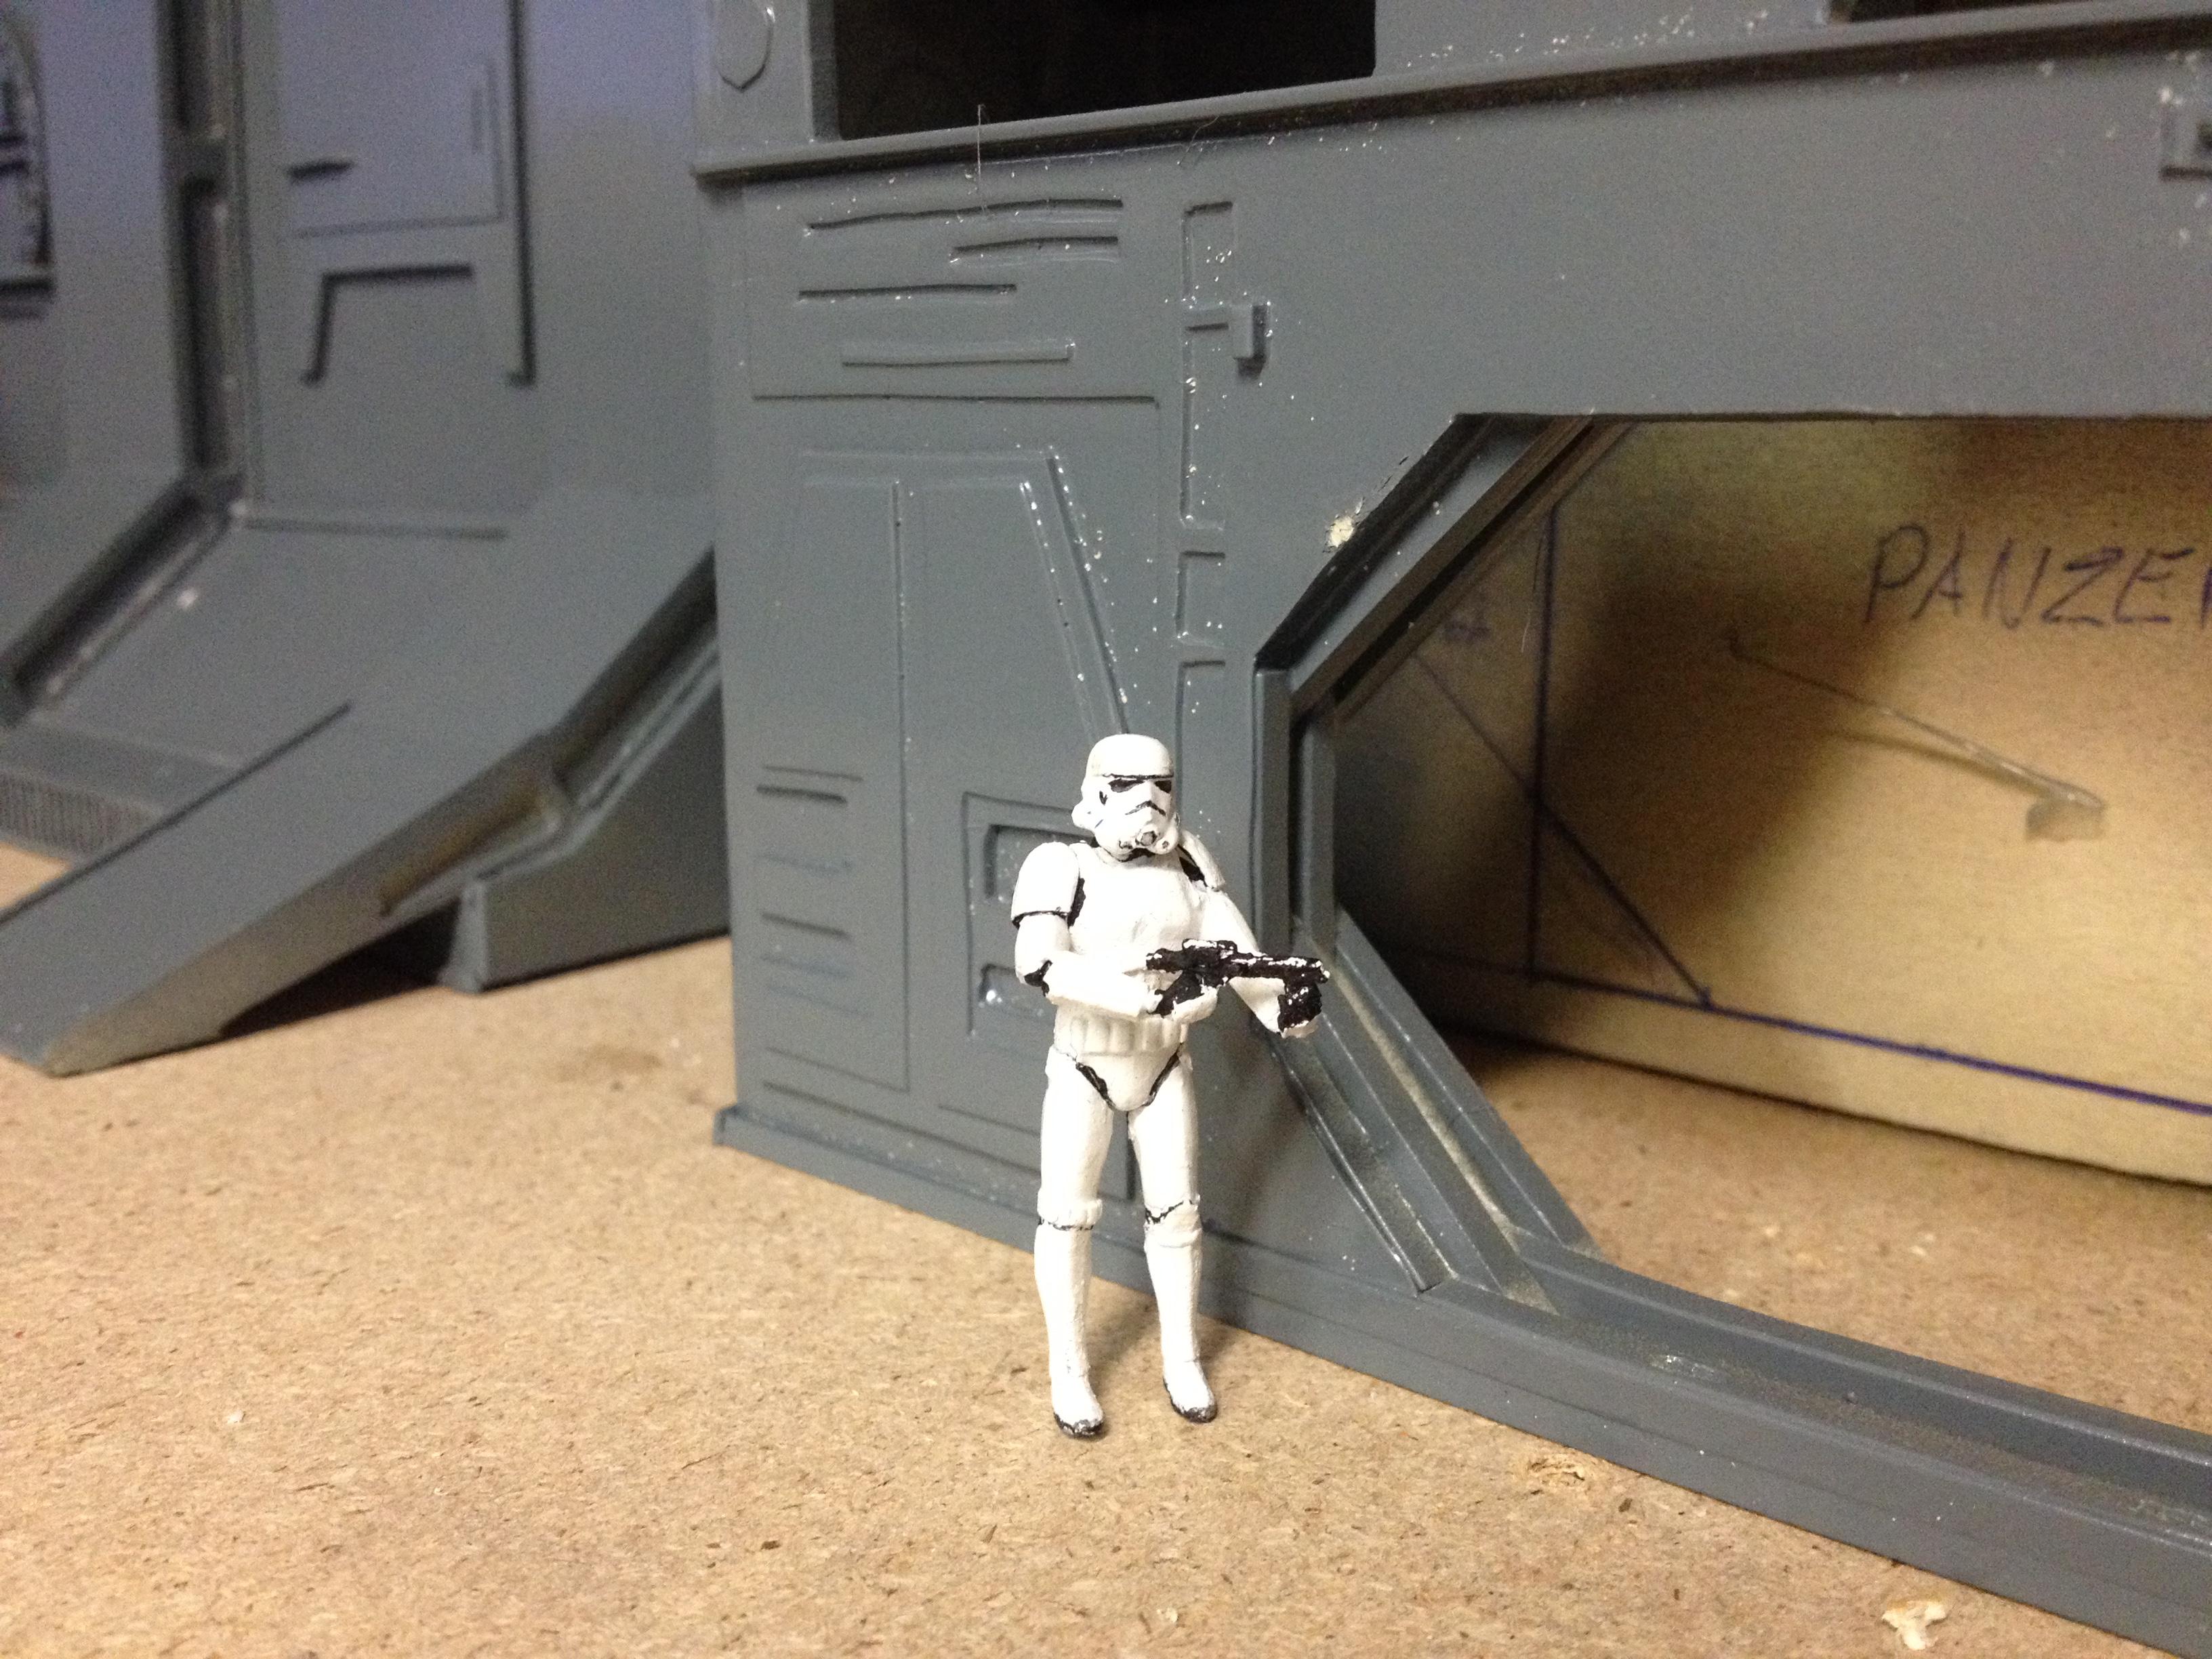 trooper-panzertre.jpg